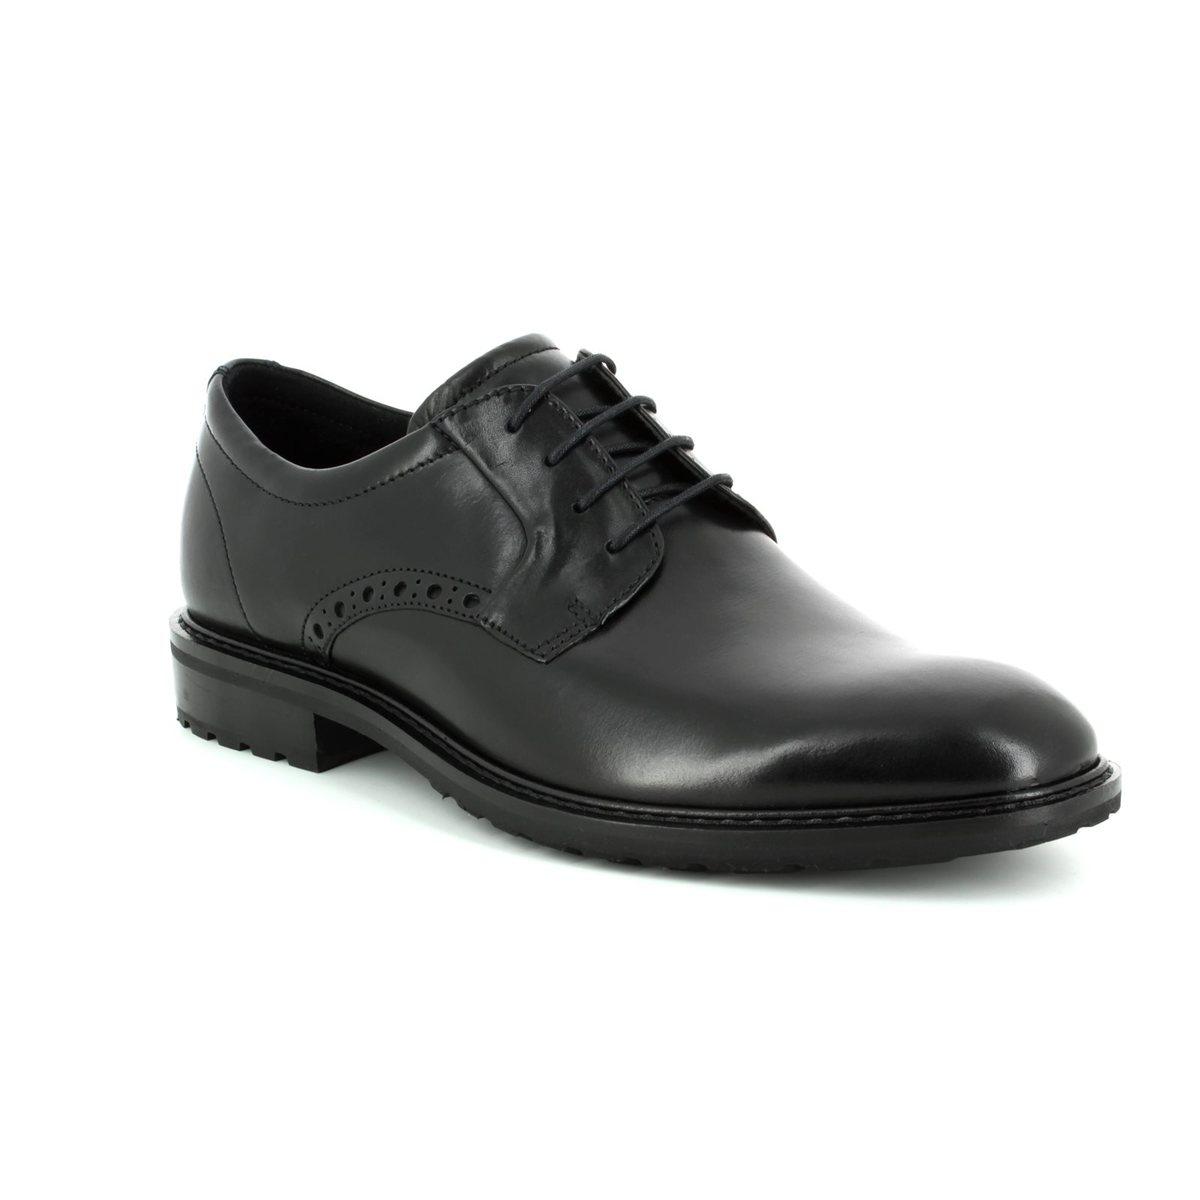 9bffd3095e ECCO Formal Shoes - Black - 640304 01001 VITRUS I